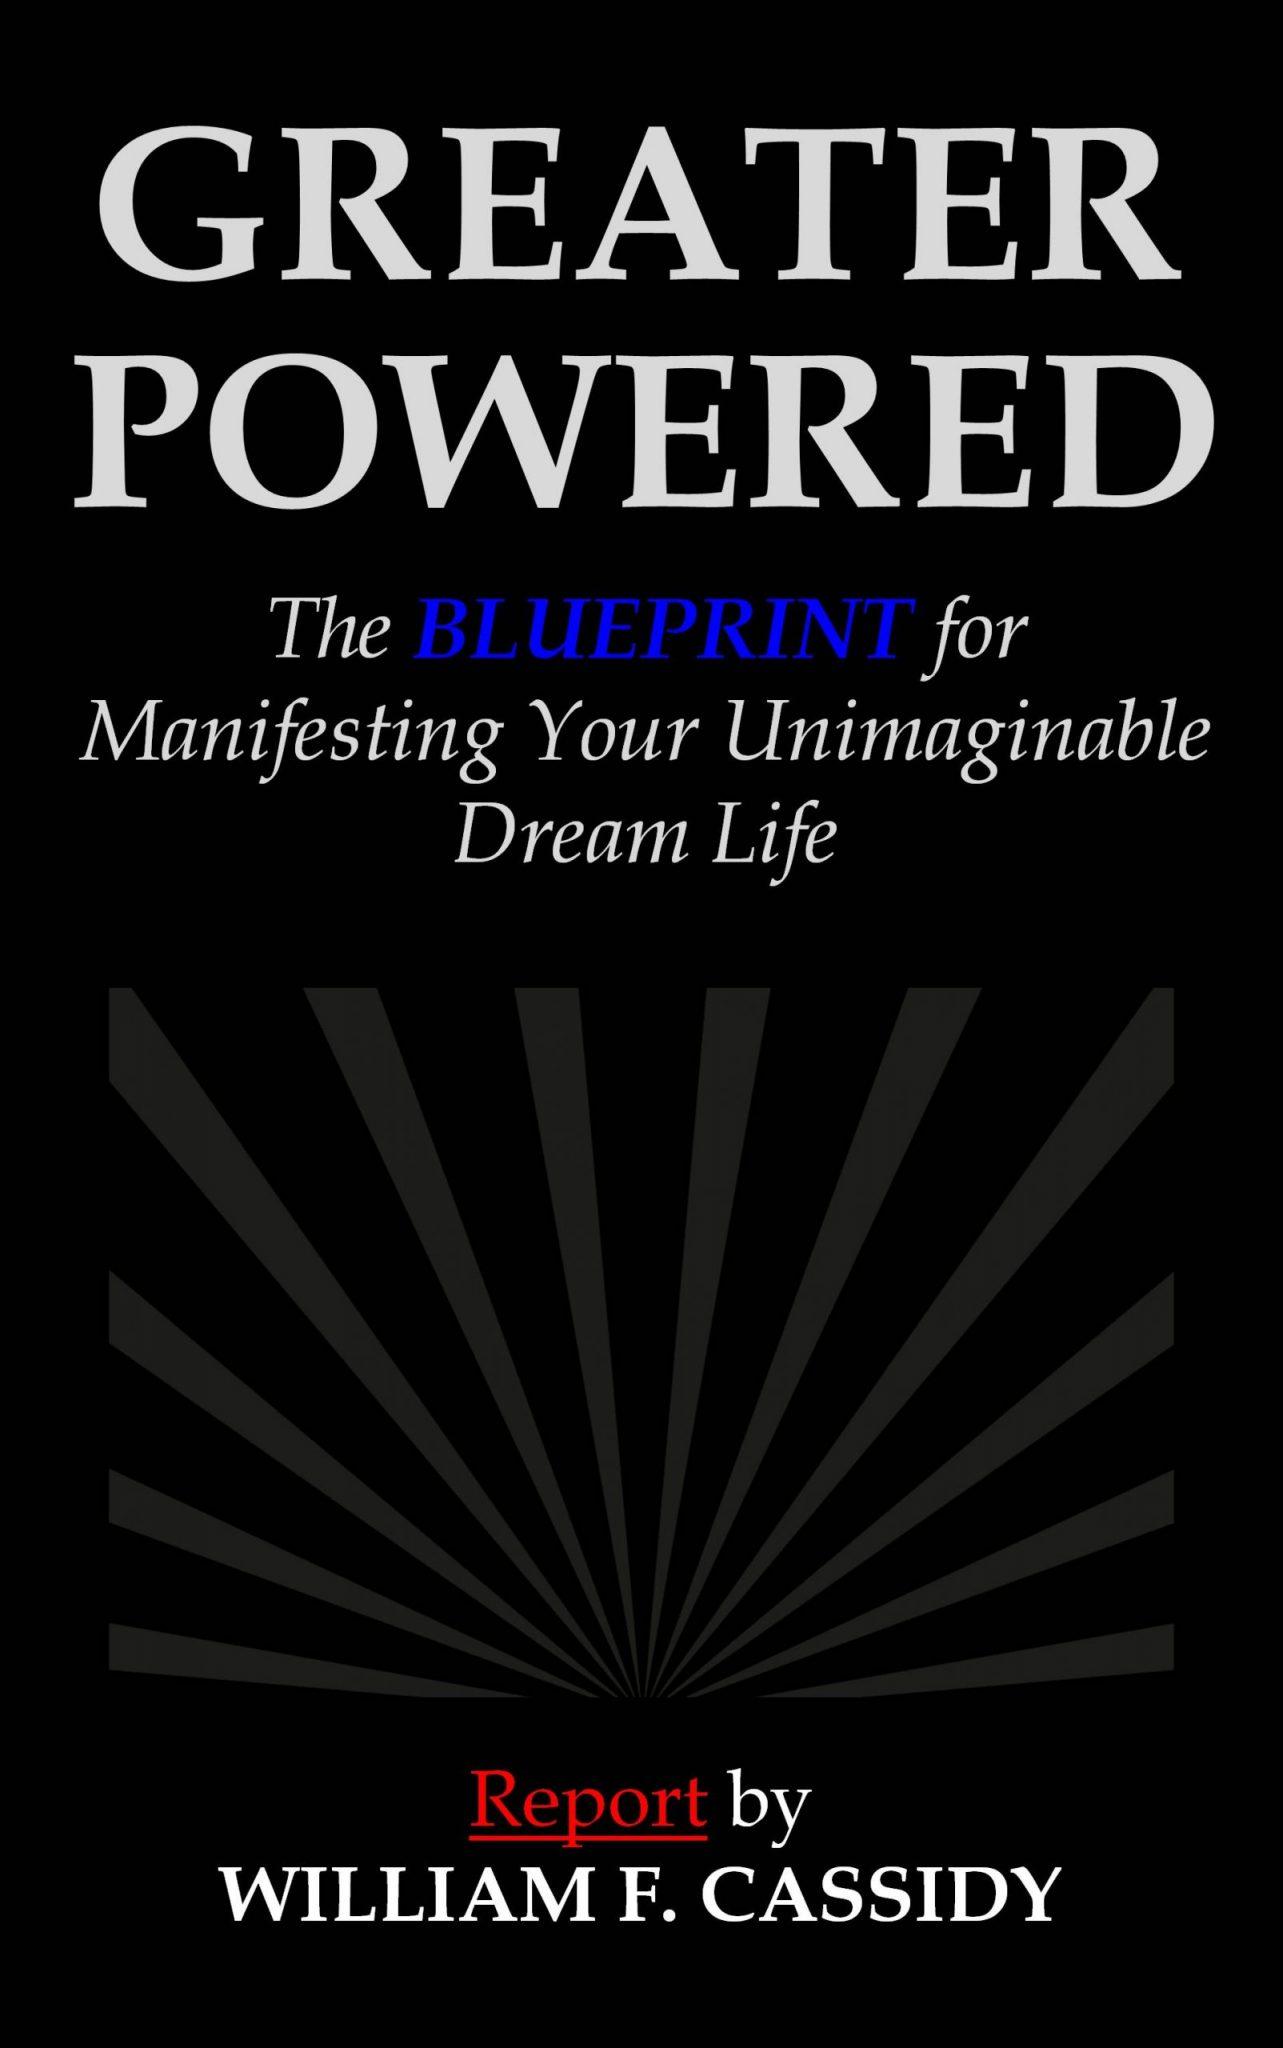 Greater Powered Blueprint